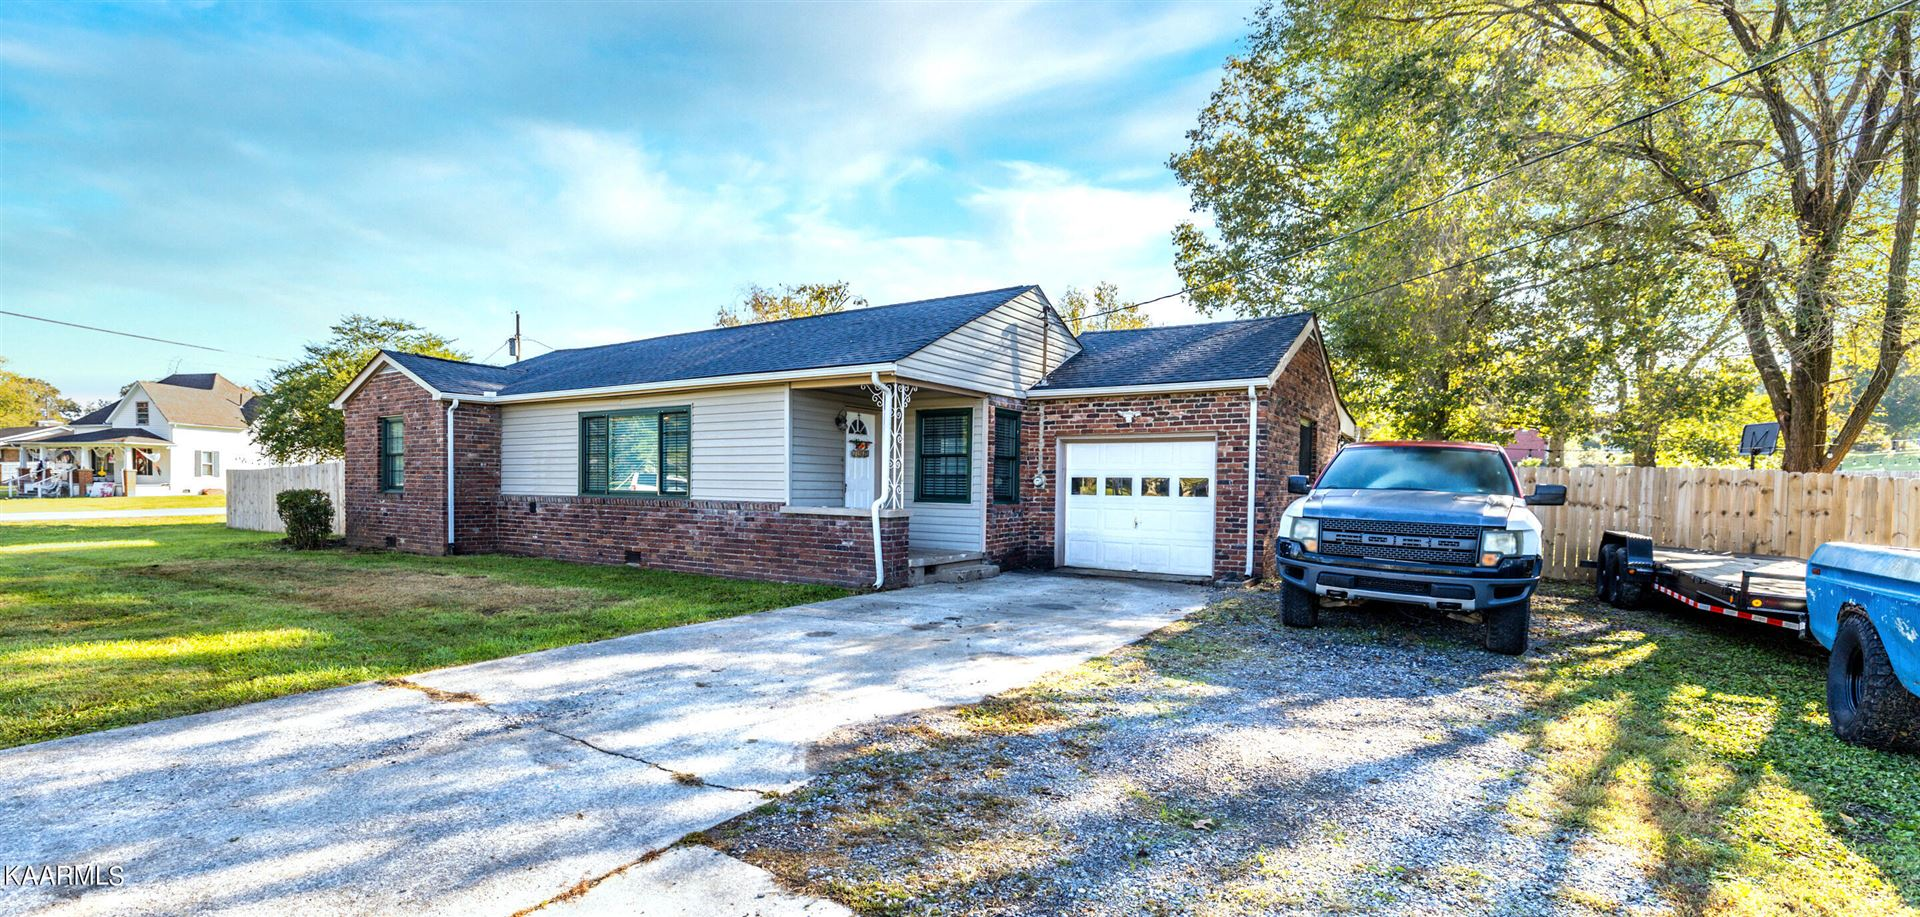 Photo of 2920 Byington Beaver Ridge Rd, Knoxville, TN 37931 (MLS # 1171865)